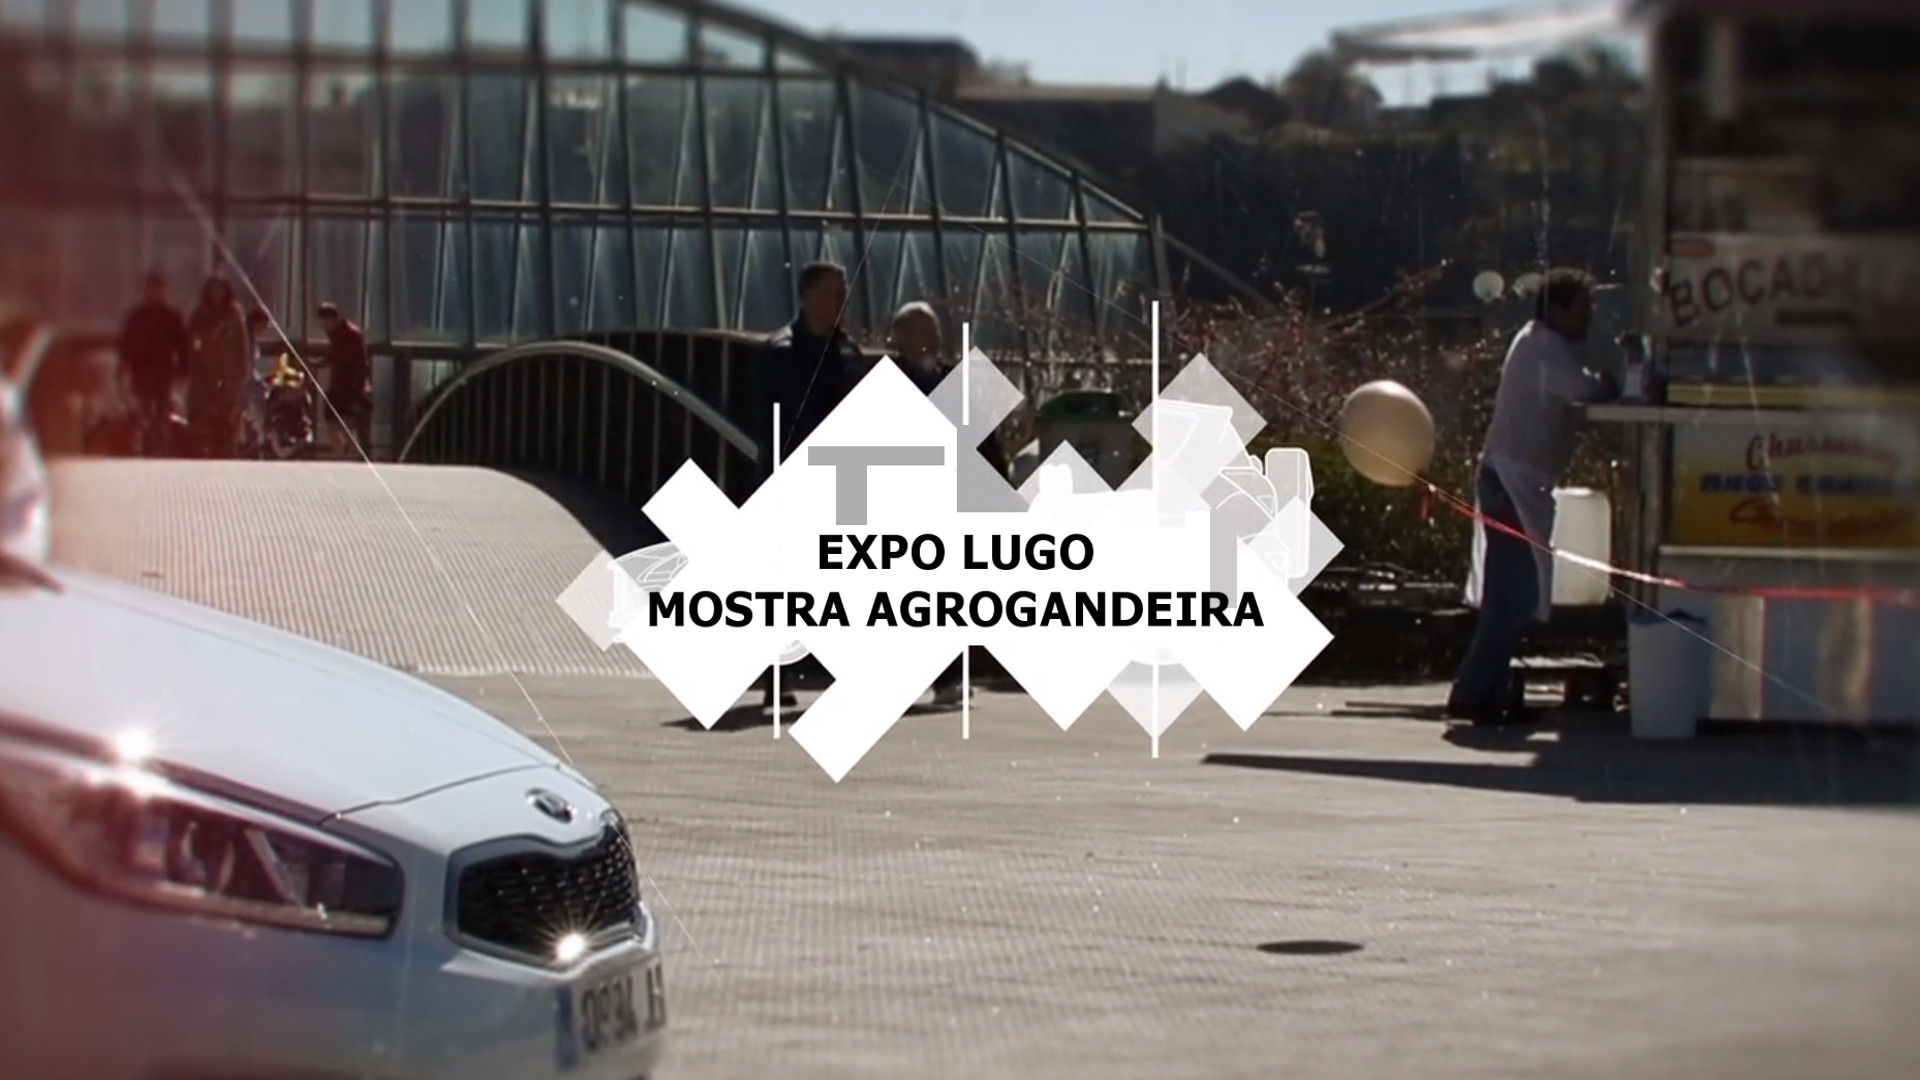 Expo Lugo Mostra Agrogandeira.